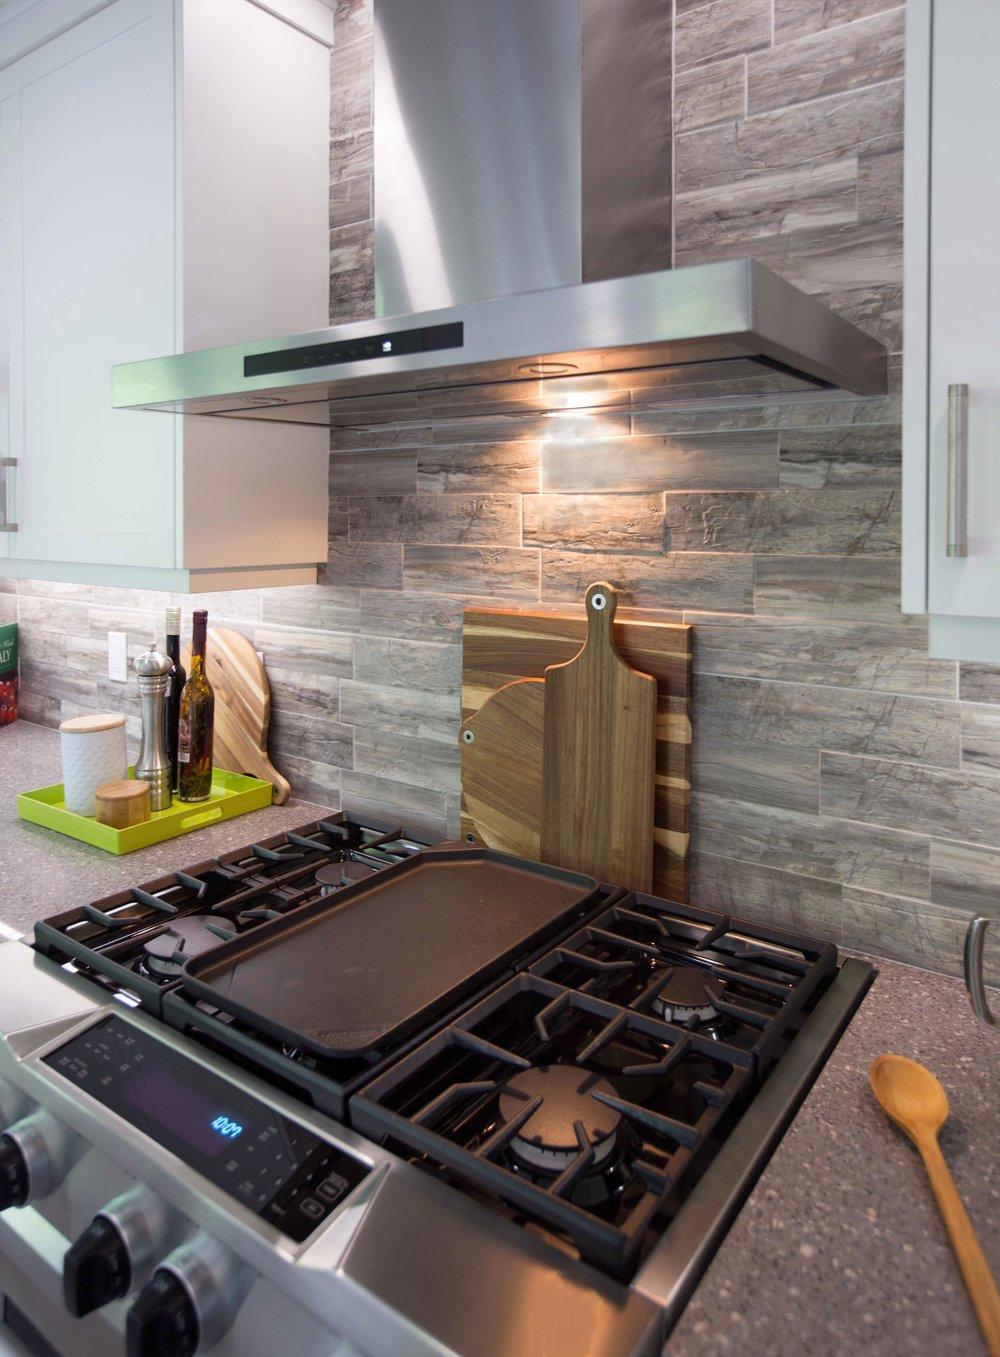 KitchenAid Stove-Kitchen Design-Kitchen Renovation-Style Maven Decor Interior Design-Edmonton Canada